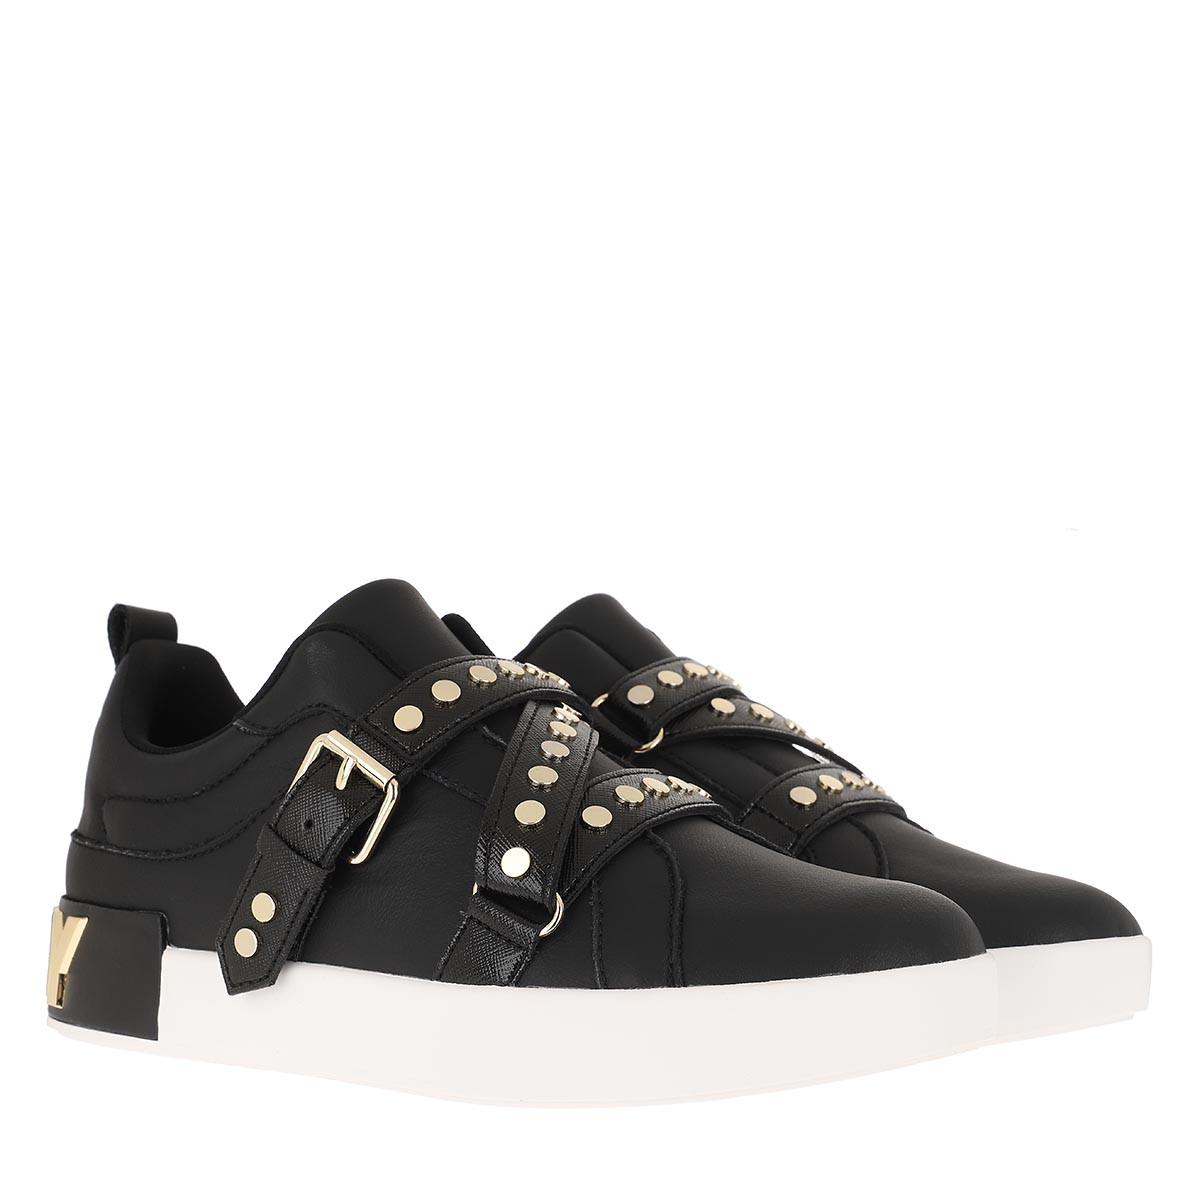 DKNY Sneakers - Studz Sneaker Black - in schwarz - für Damen